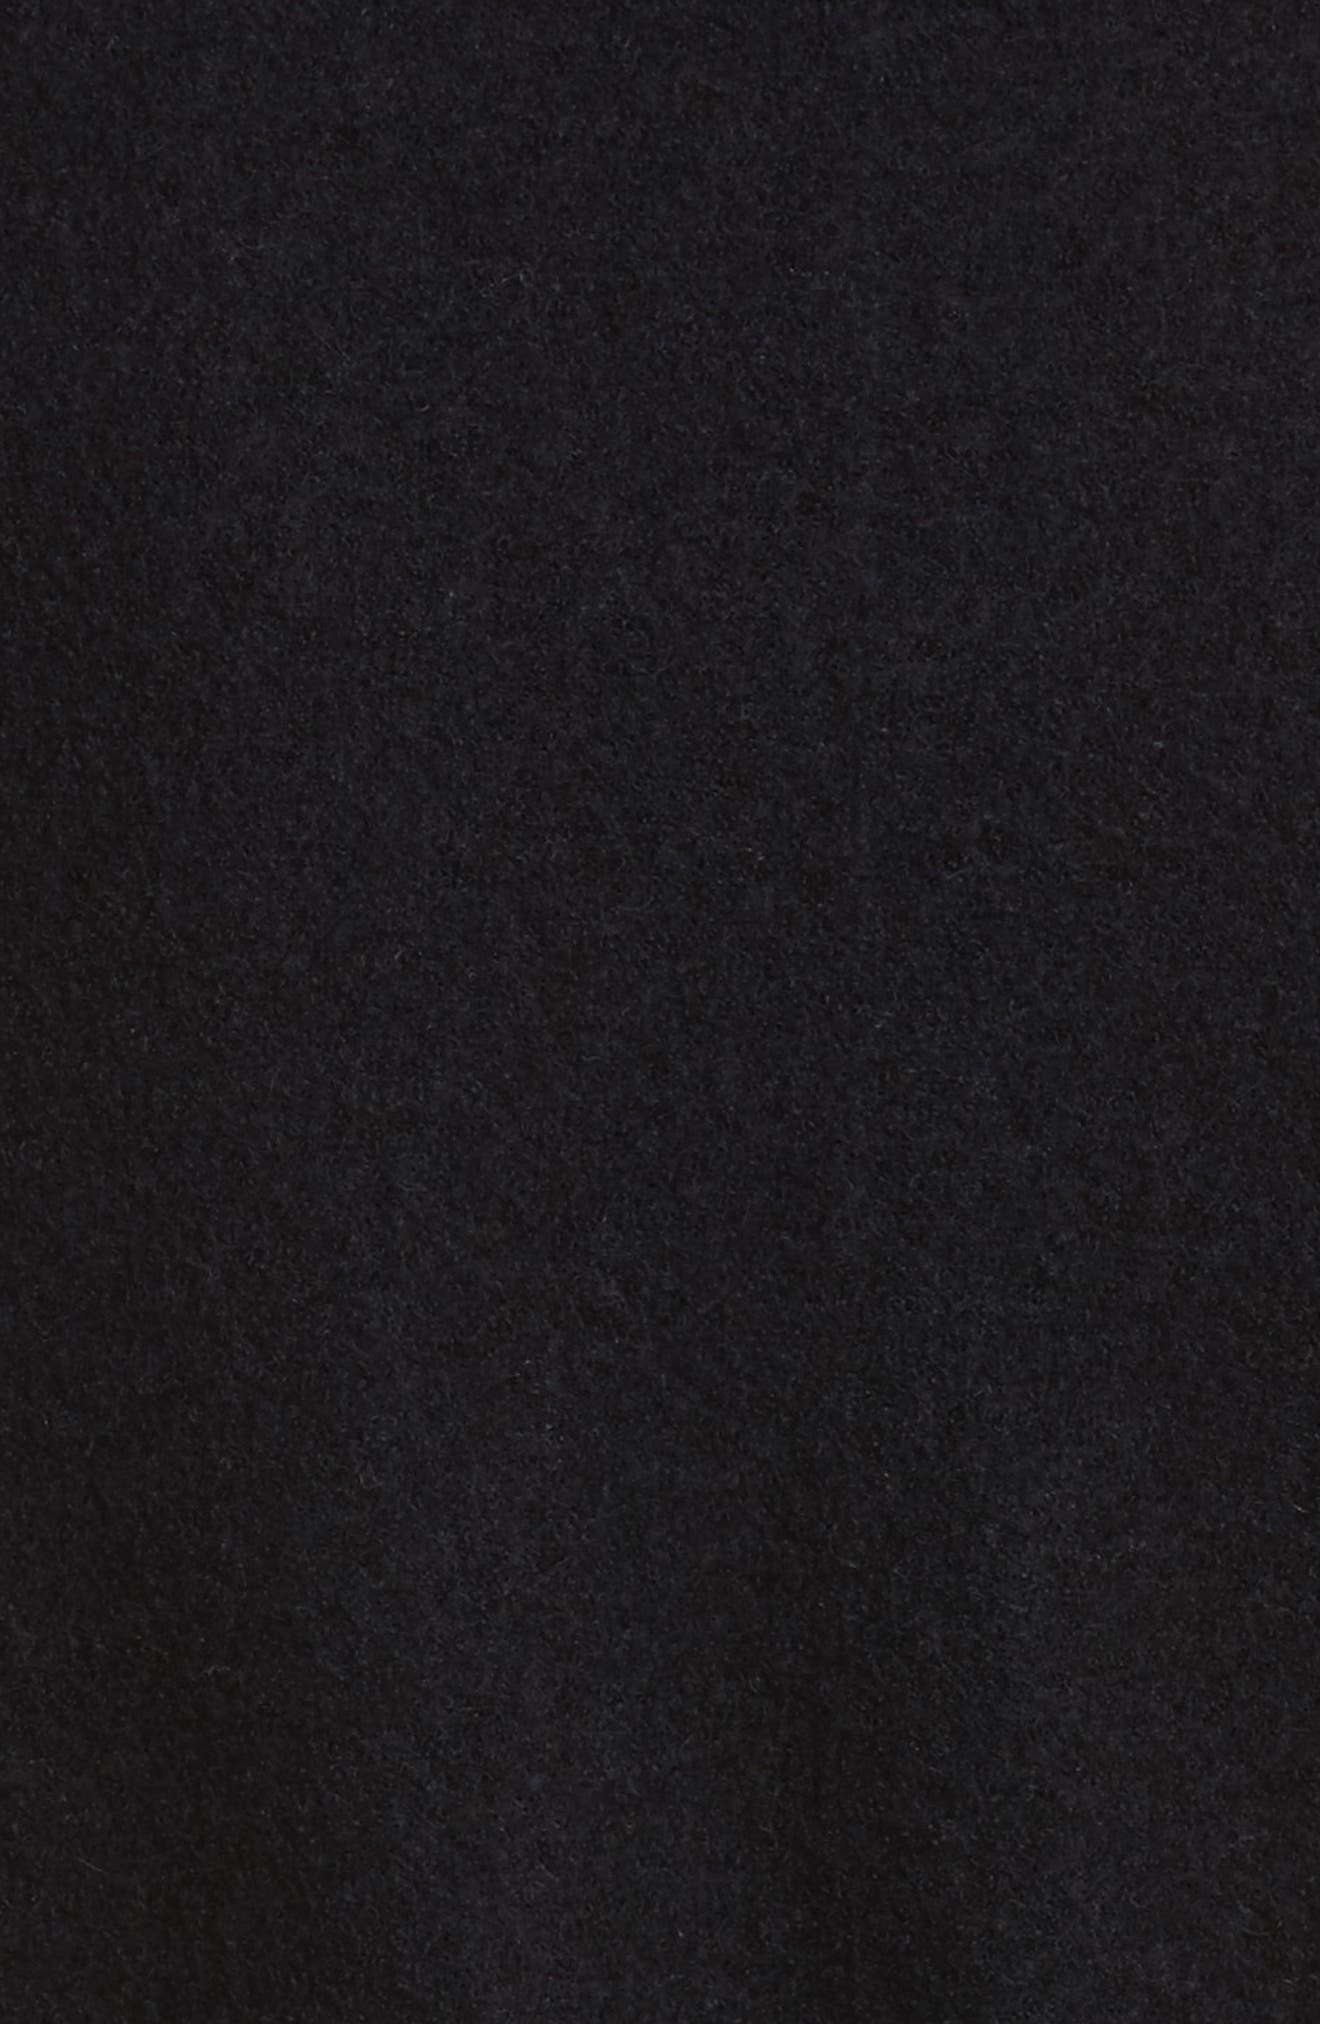 Side Slit Long Cardigan,                             Alternate thumbnail 5, color,                             Black